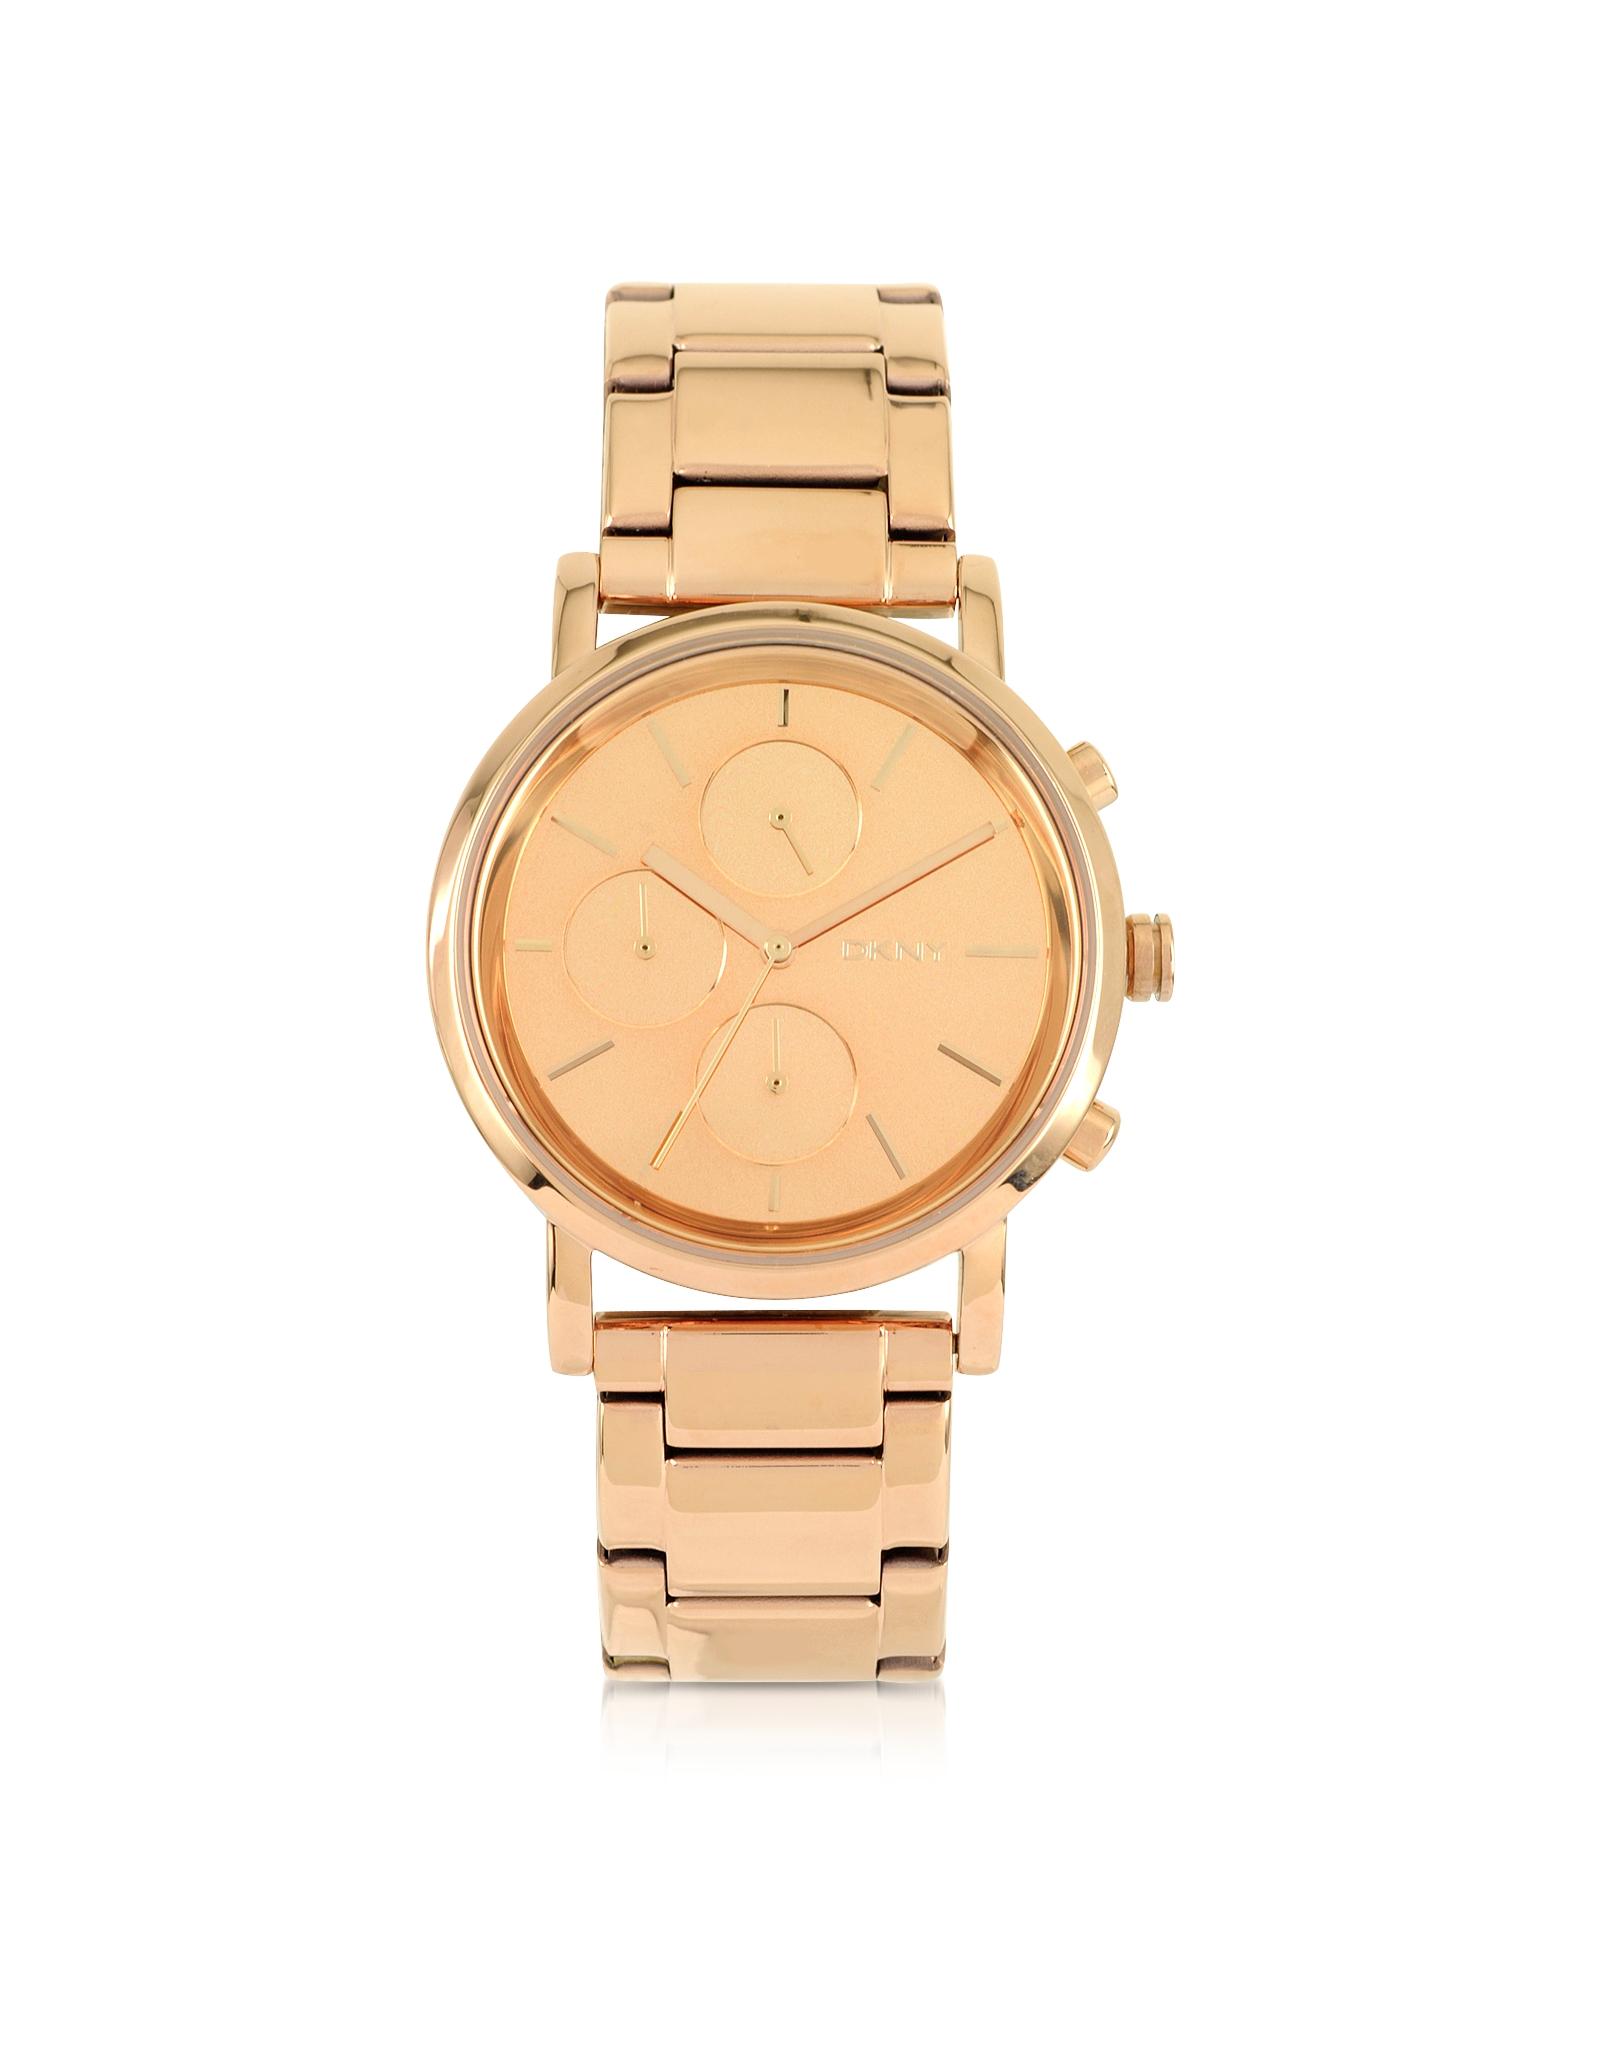 DKNY Soho Rose Golden Stainless Steel Chronograph Women's Watch